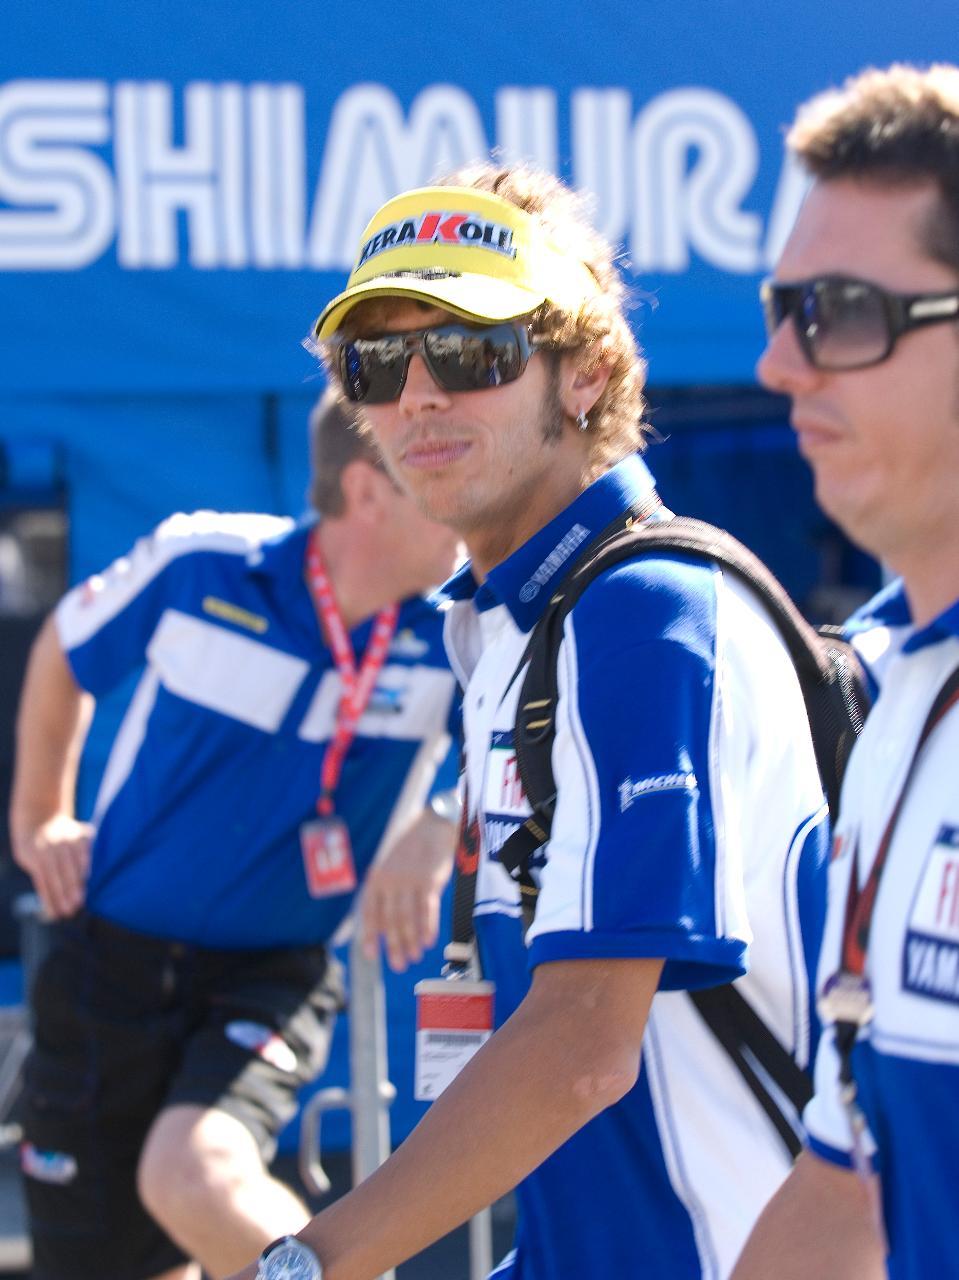 Rossi2.jpg